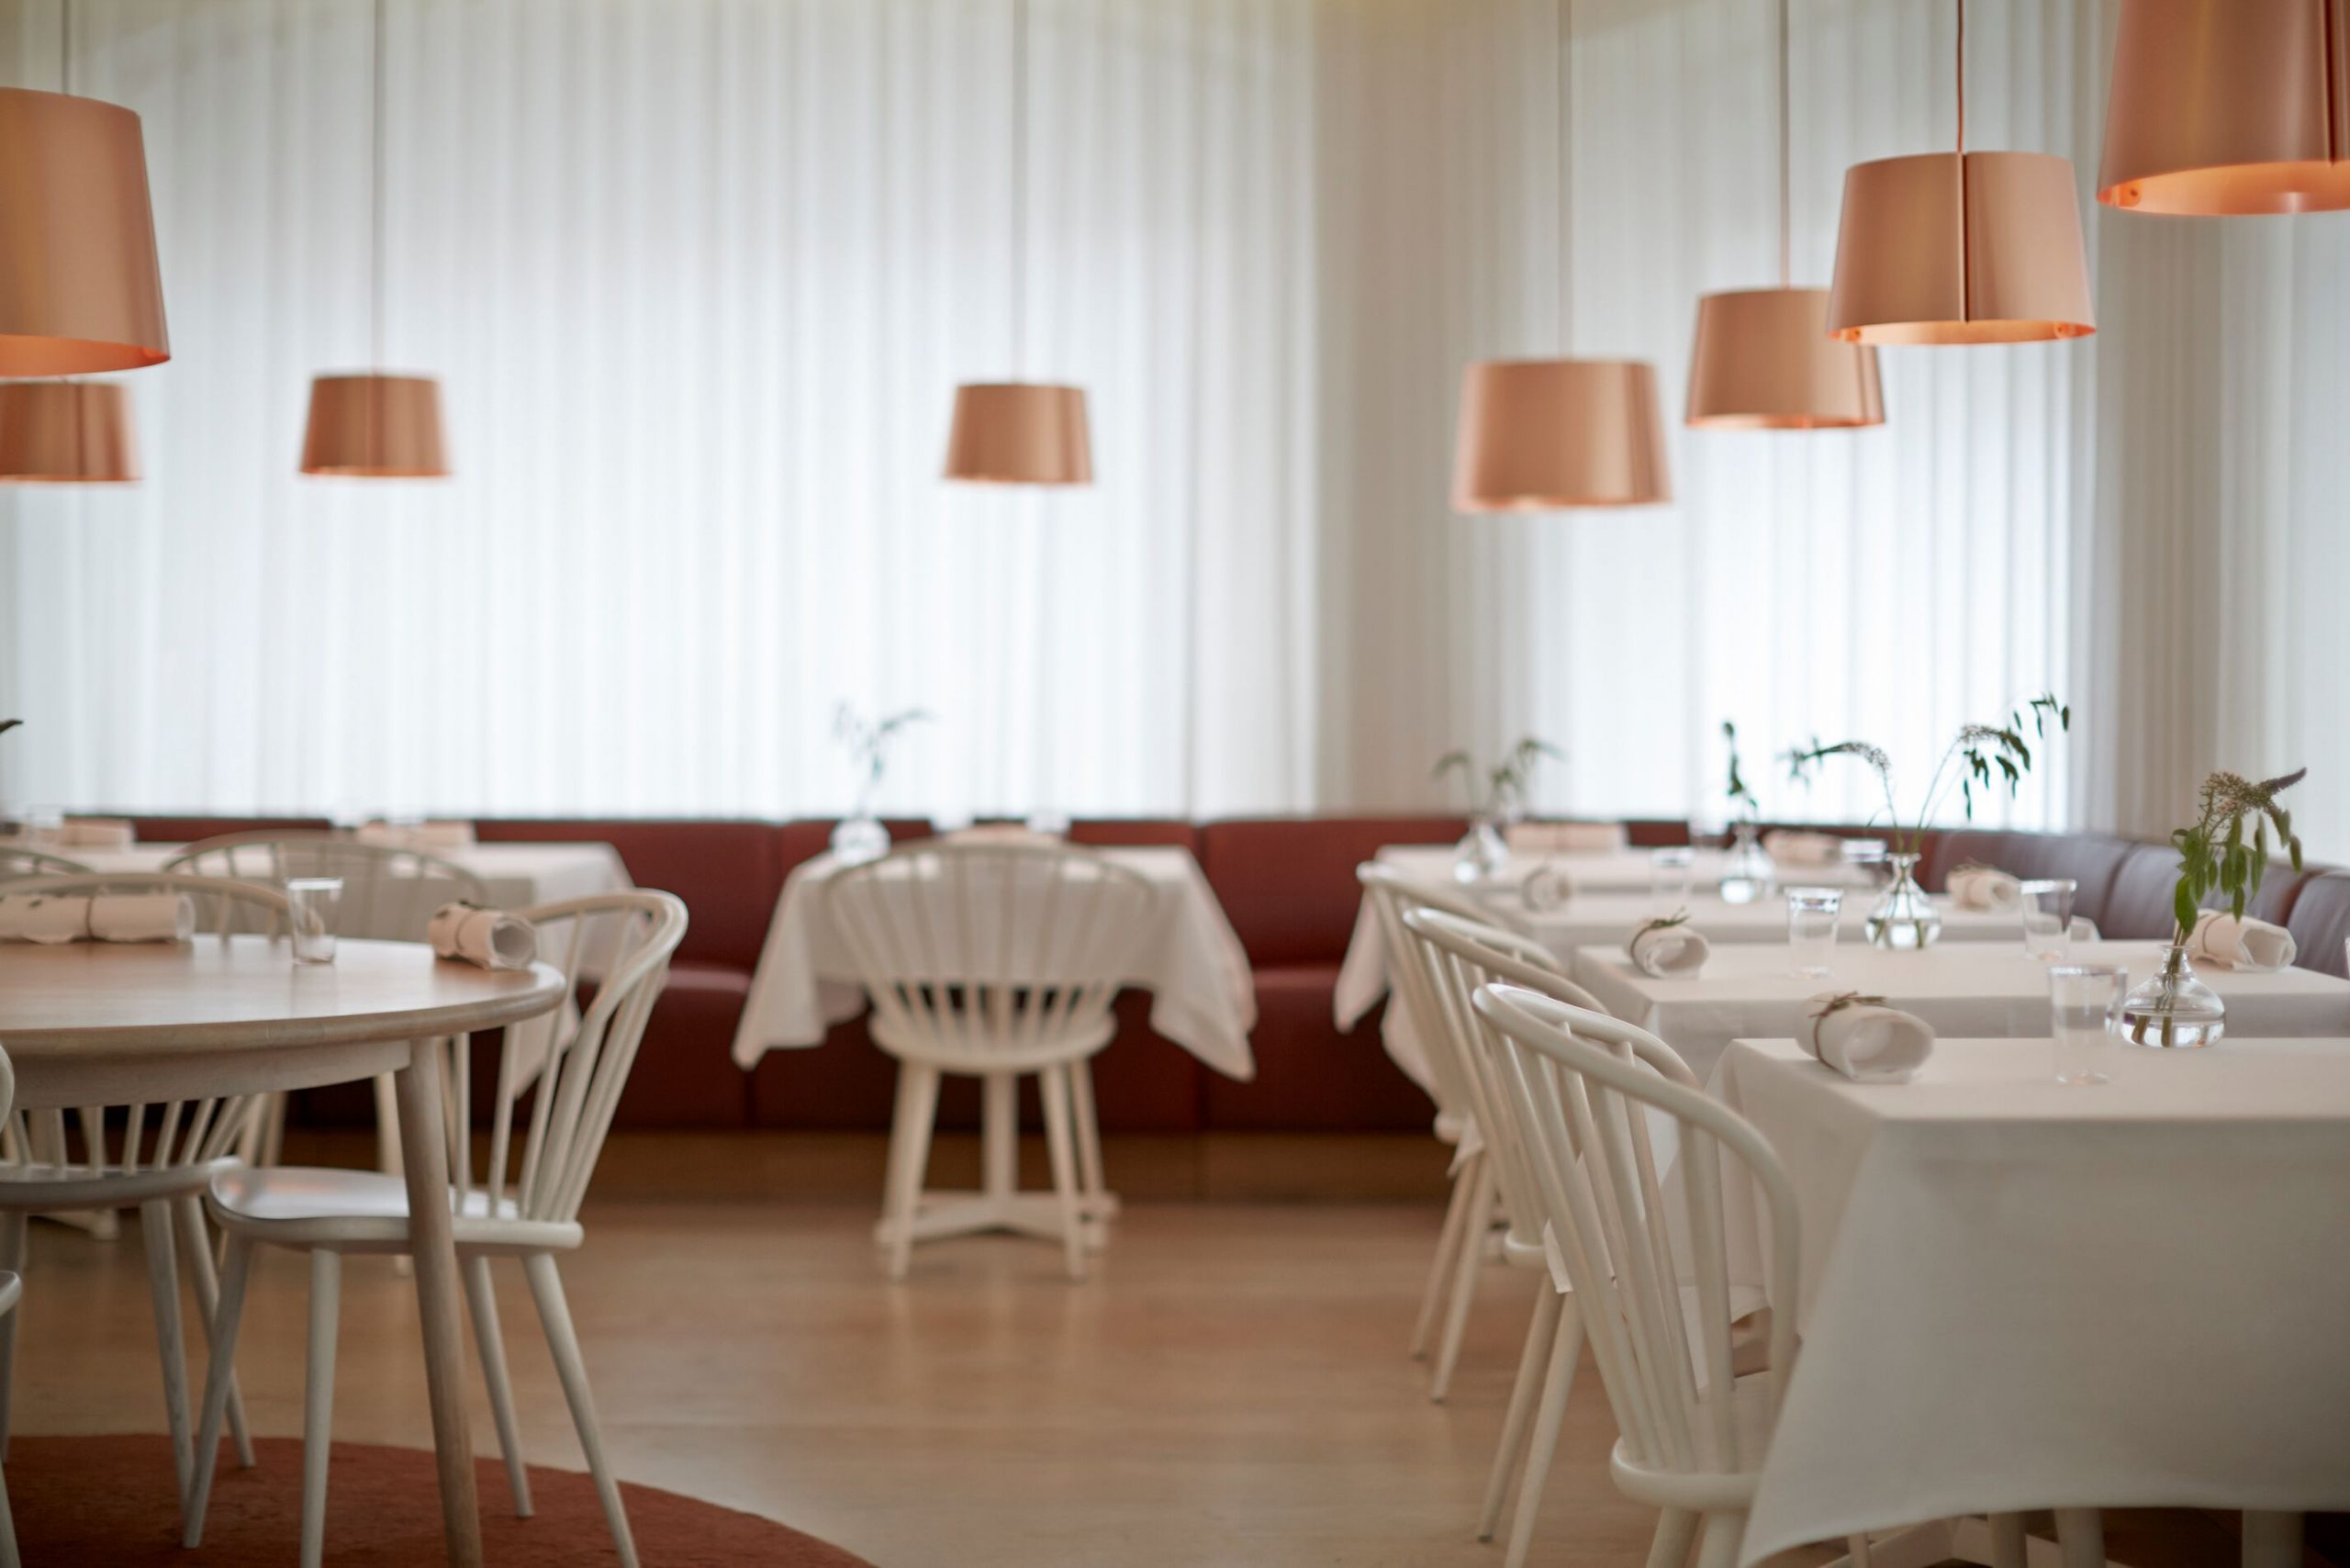 Spisesteder i Stockholm